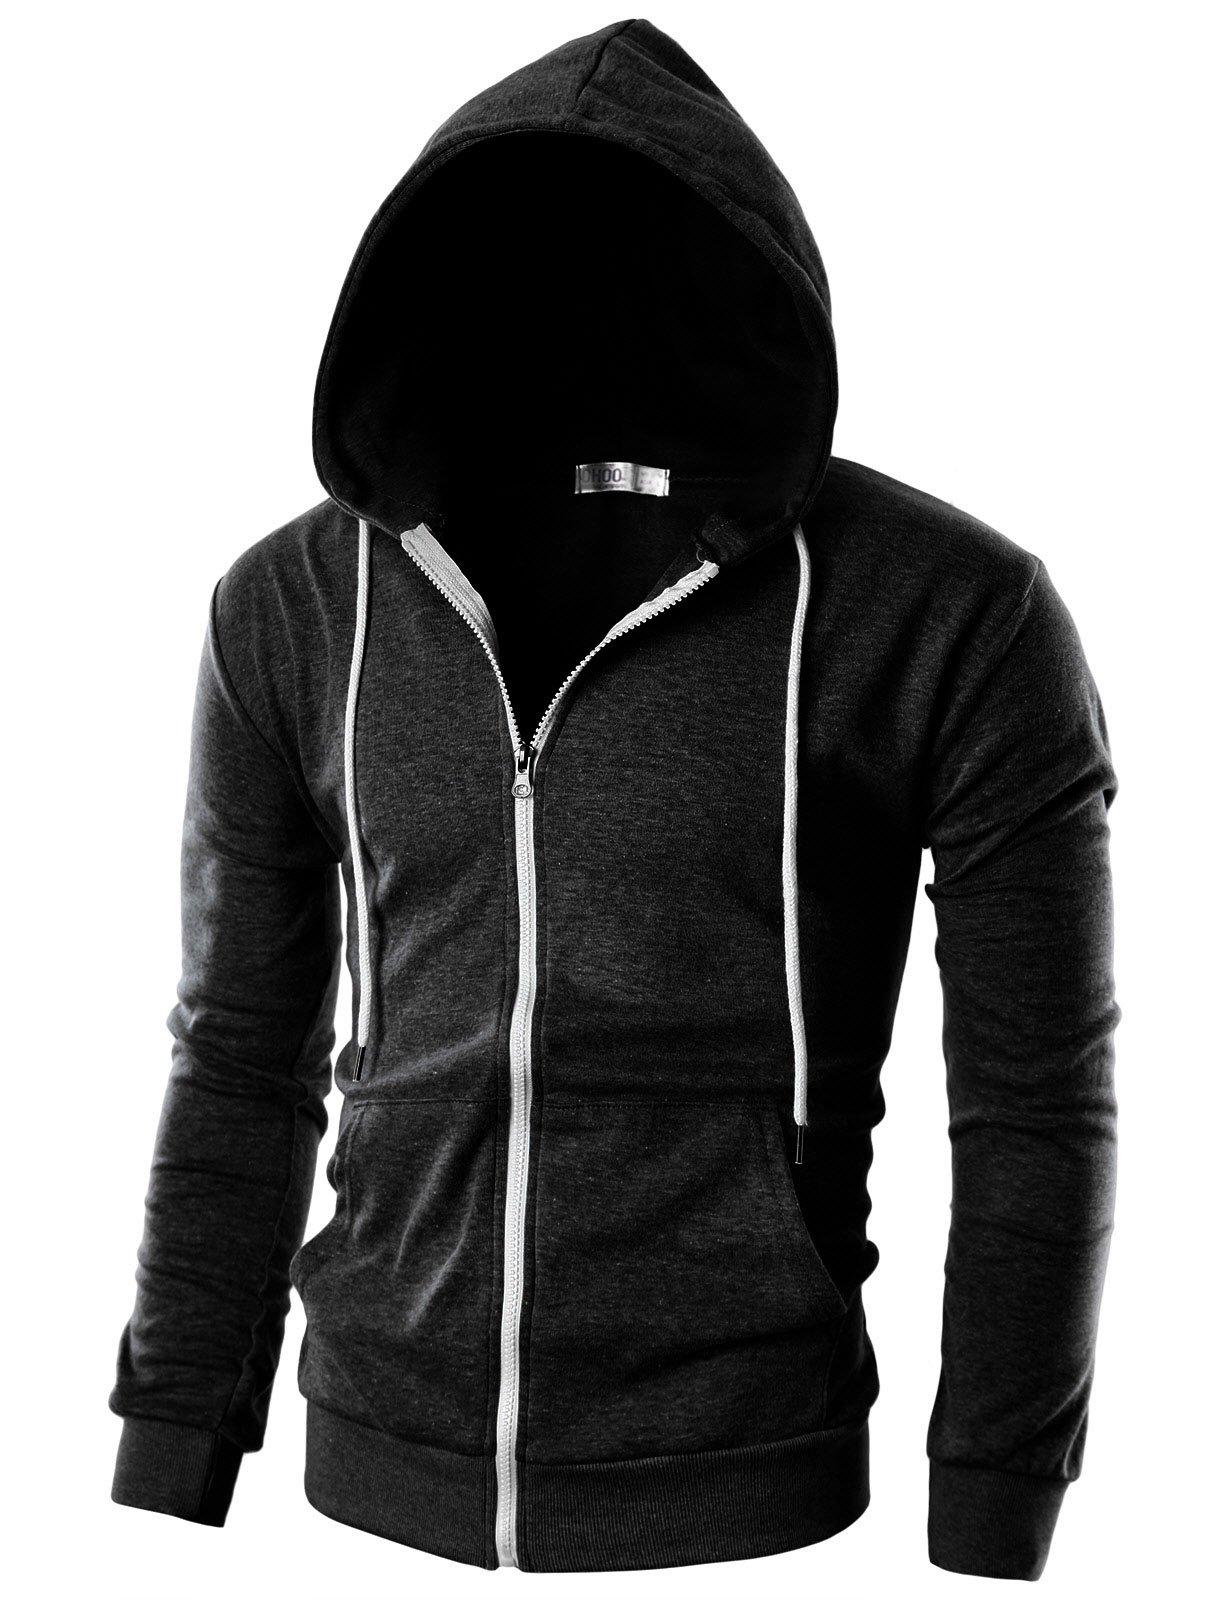 Ohoo Mens Slim Fit Long Sleeve Lightweight Zip-up Hoodie with Kanga Pocket/DCF002-CHARCOAL-L